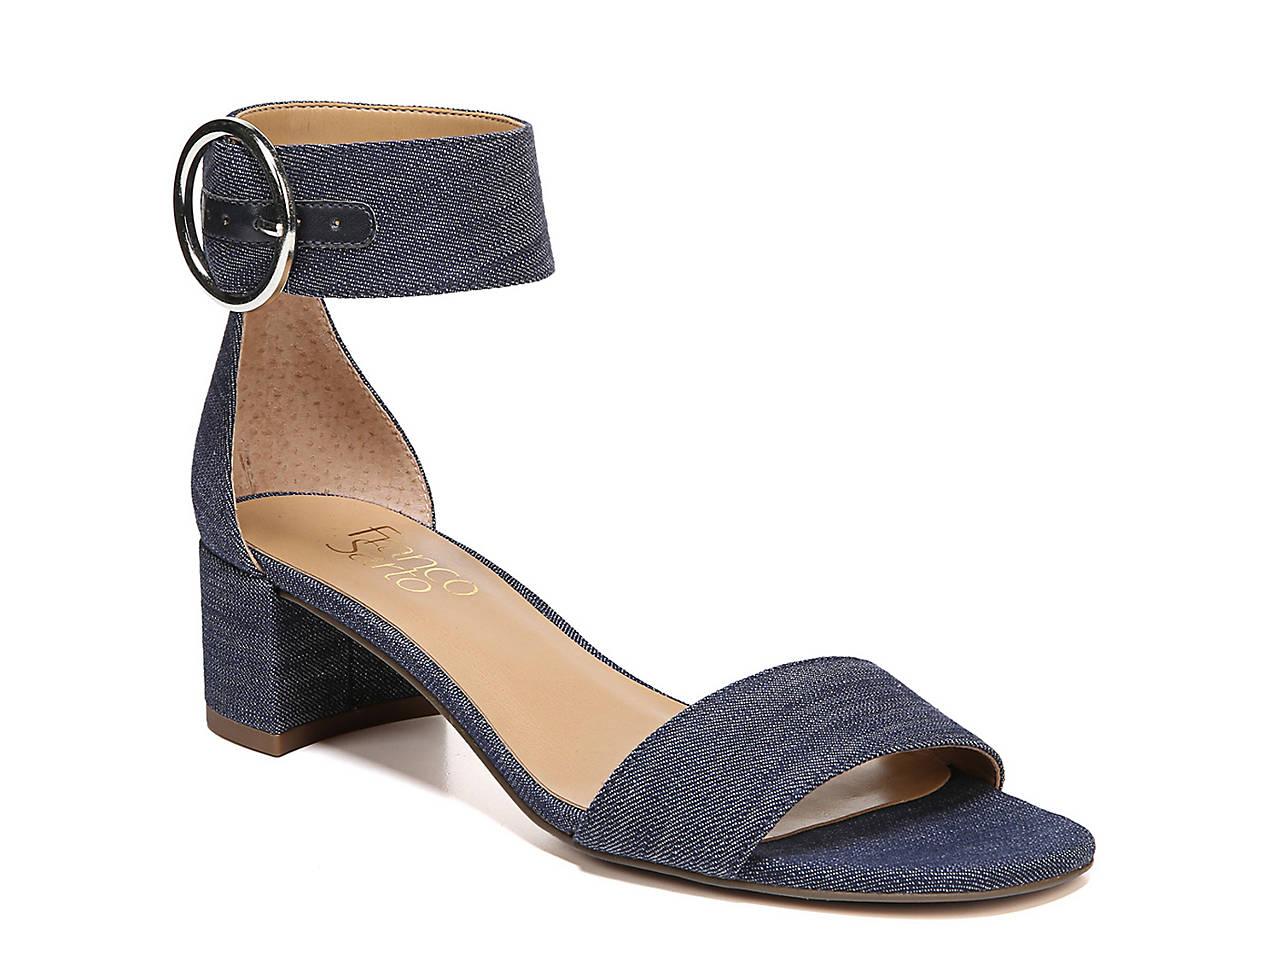 0a1067b318 Franco Sarto Ronnie Sandal Women s Shoes